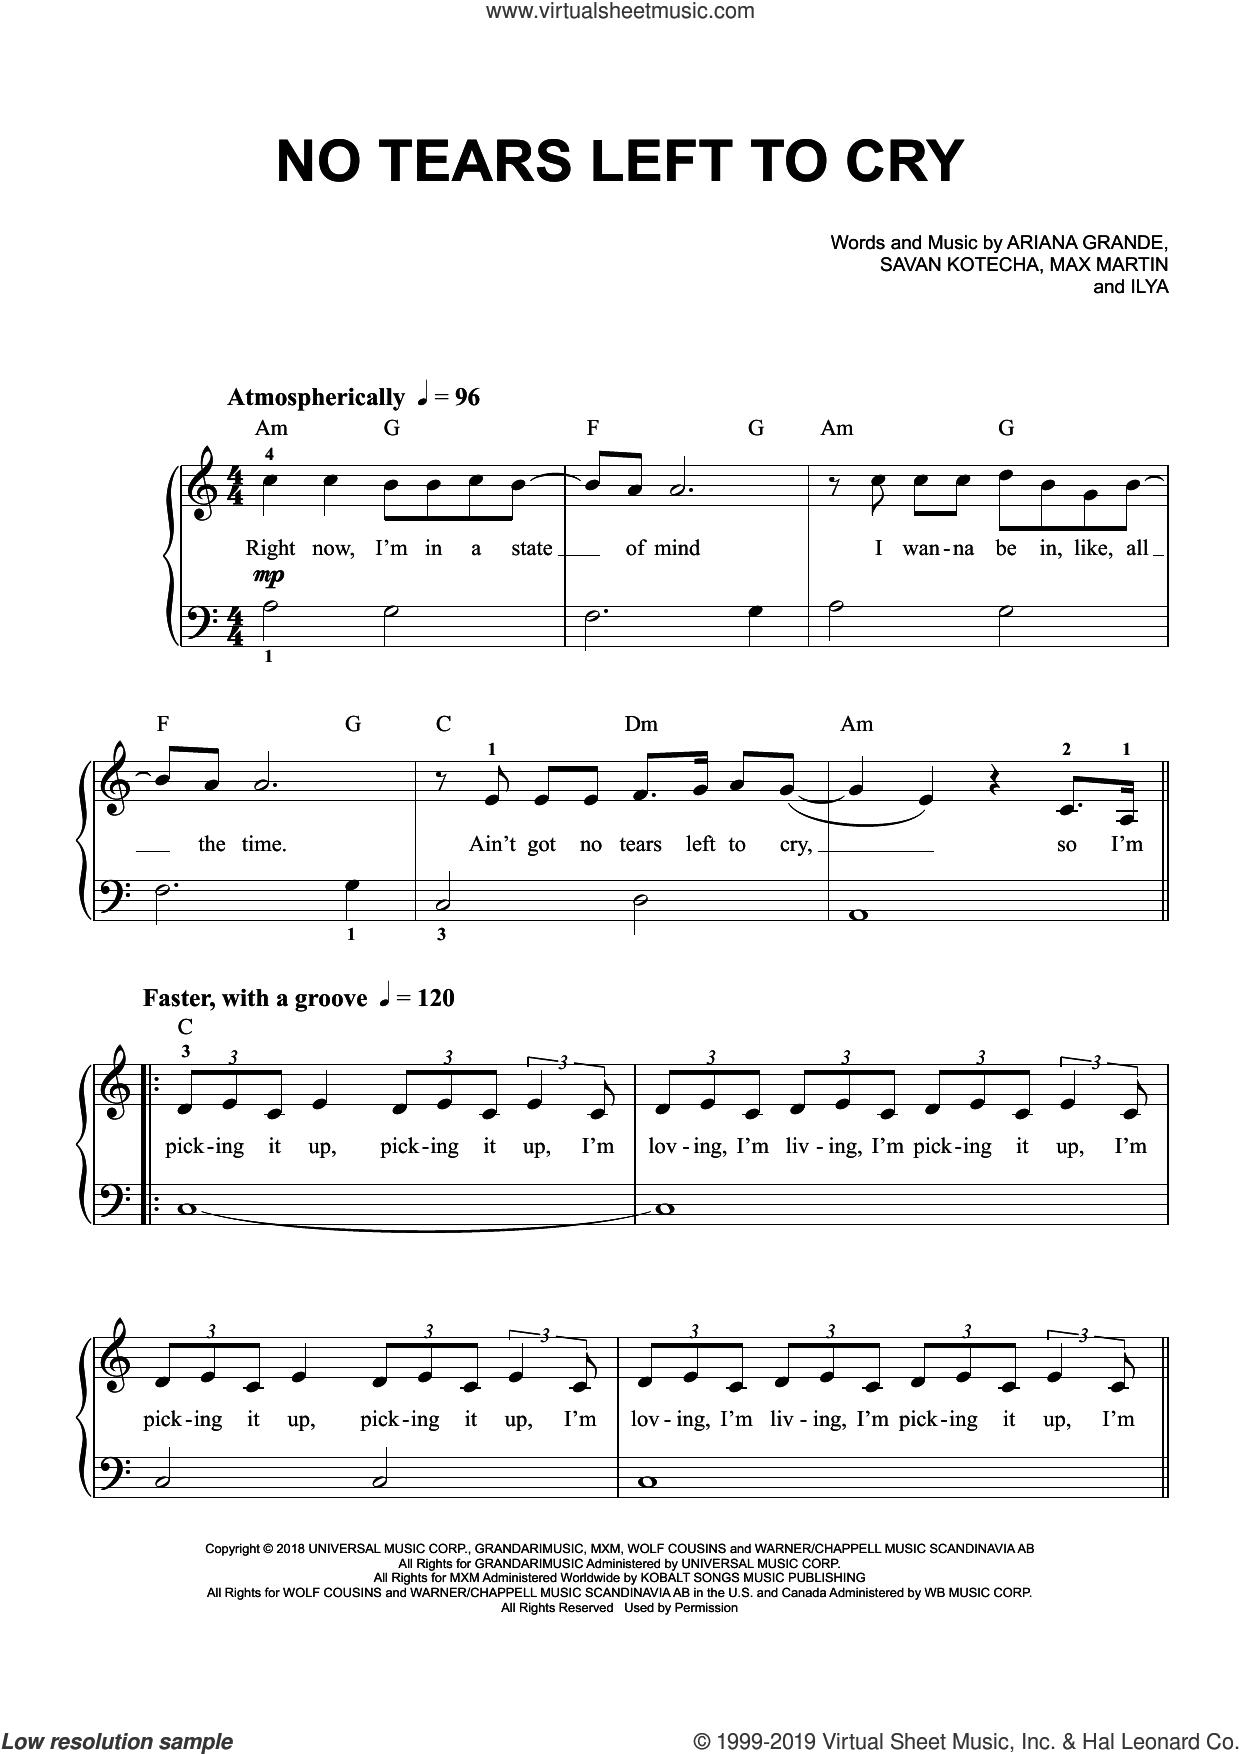 No Tears Left To Cry sheet music for piano solo by Ariana Grande, Ilya, Max Martin and Savan Kotecha, easy skill level